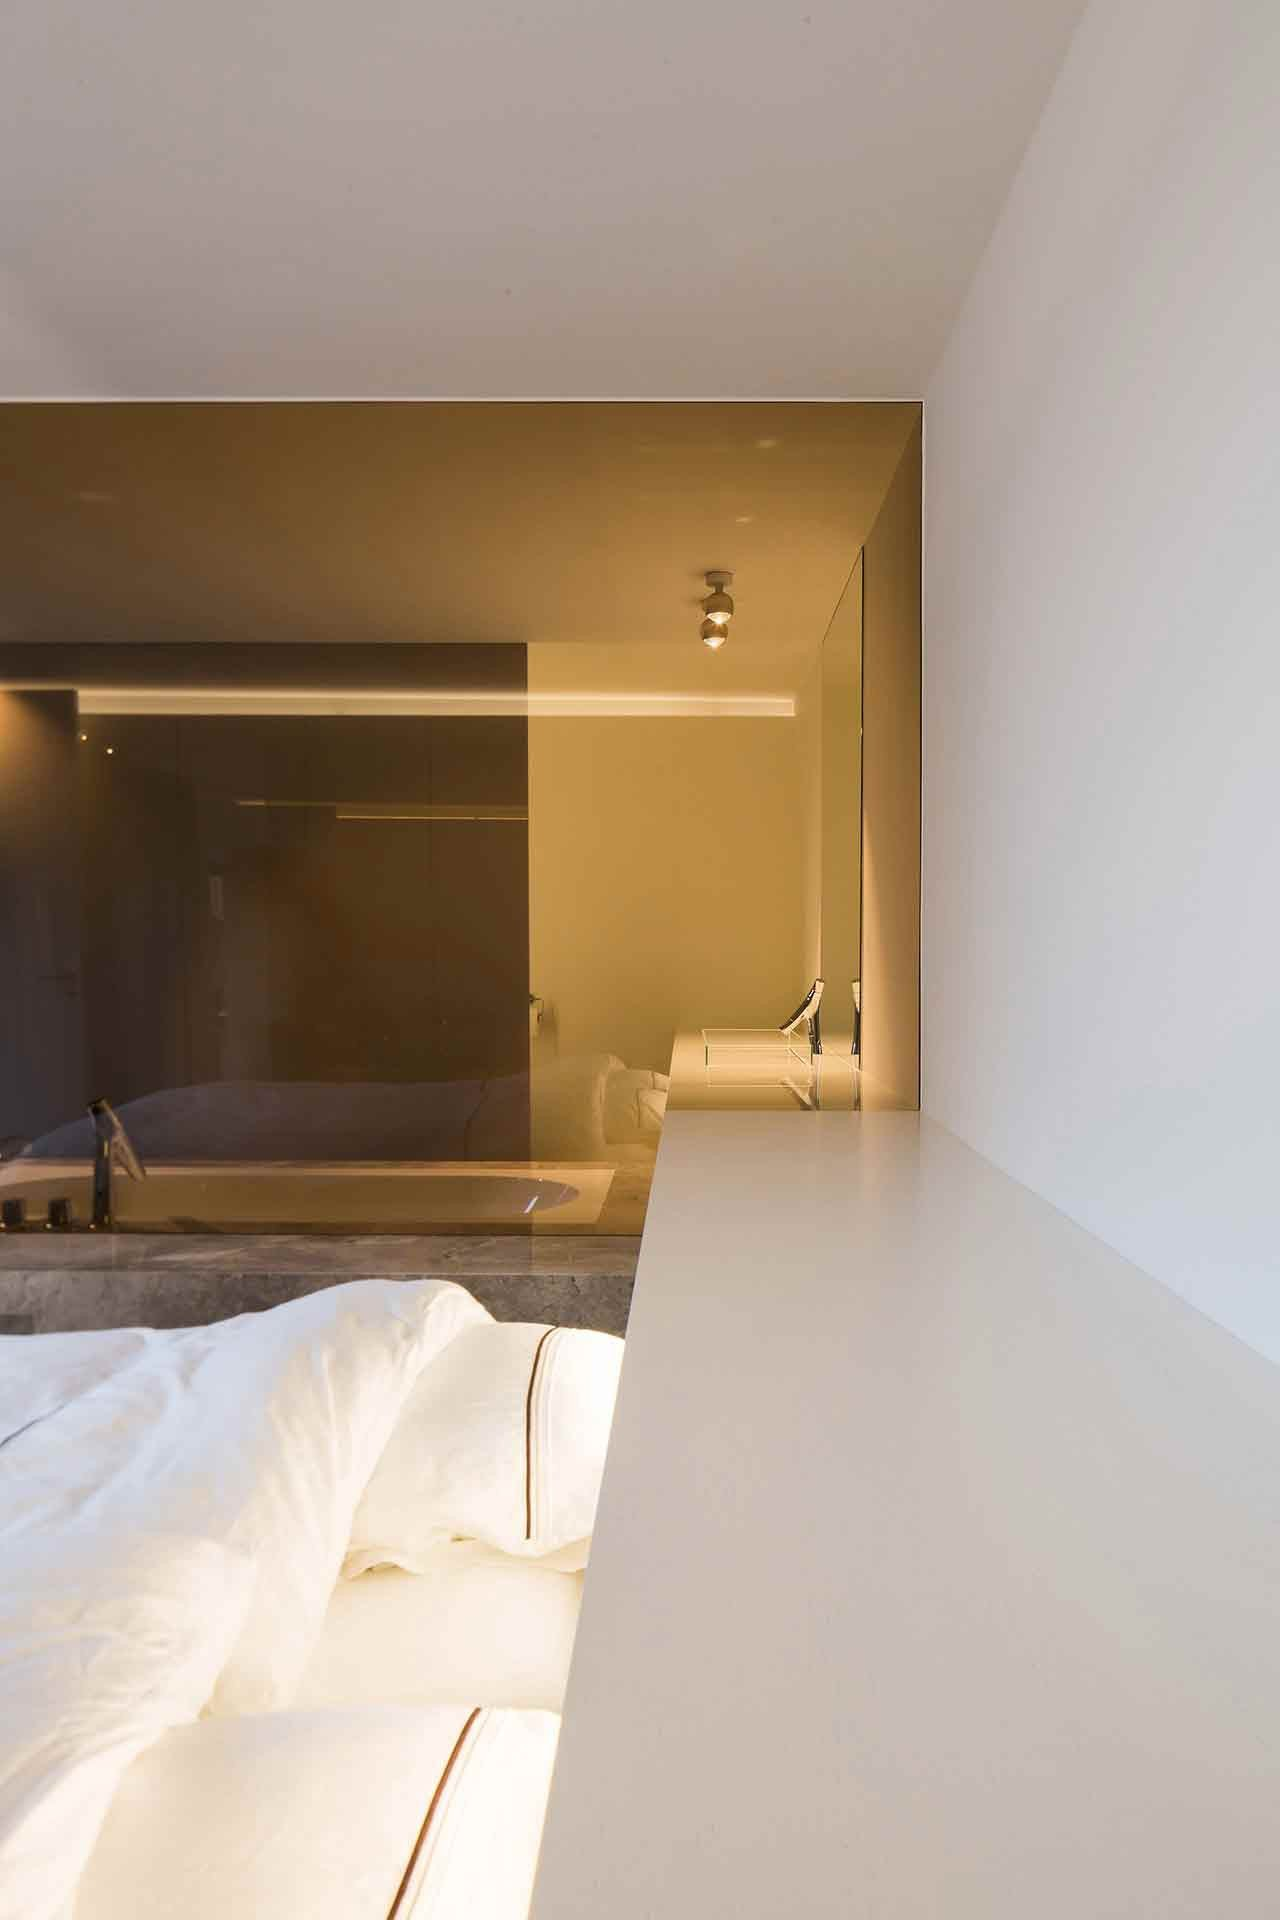 Totaalinrichting-badkamer-modern-SintMartenLatem-2.jpg